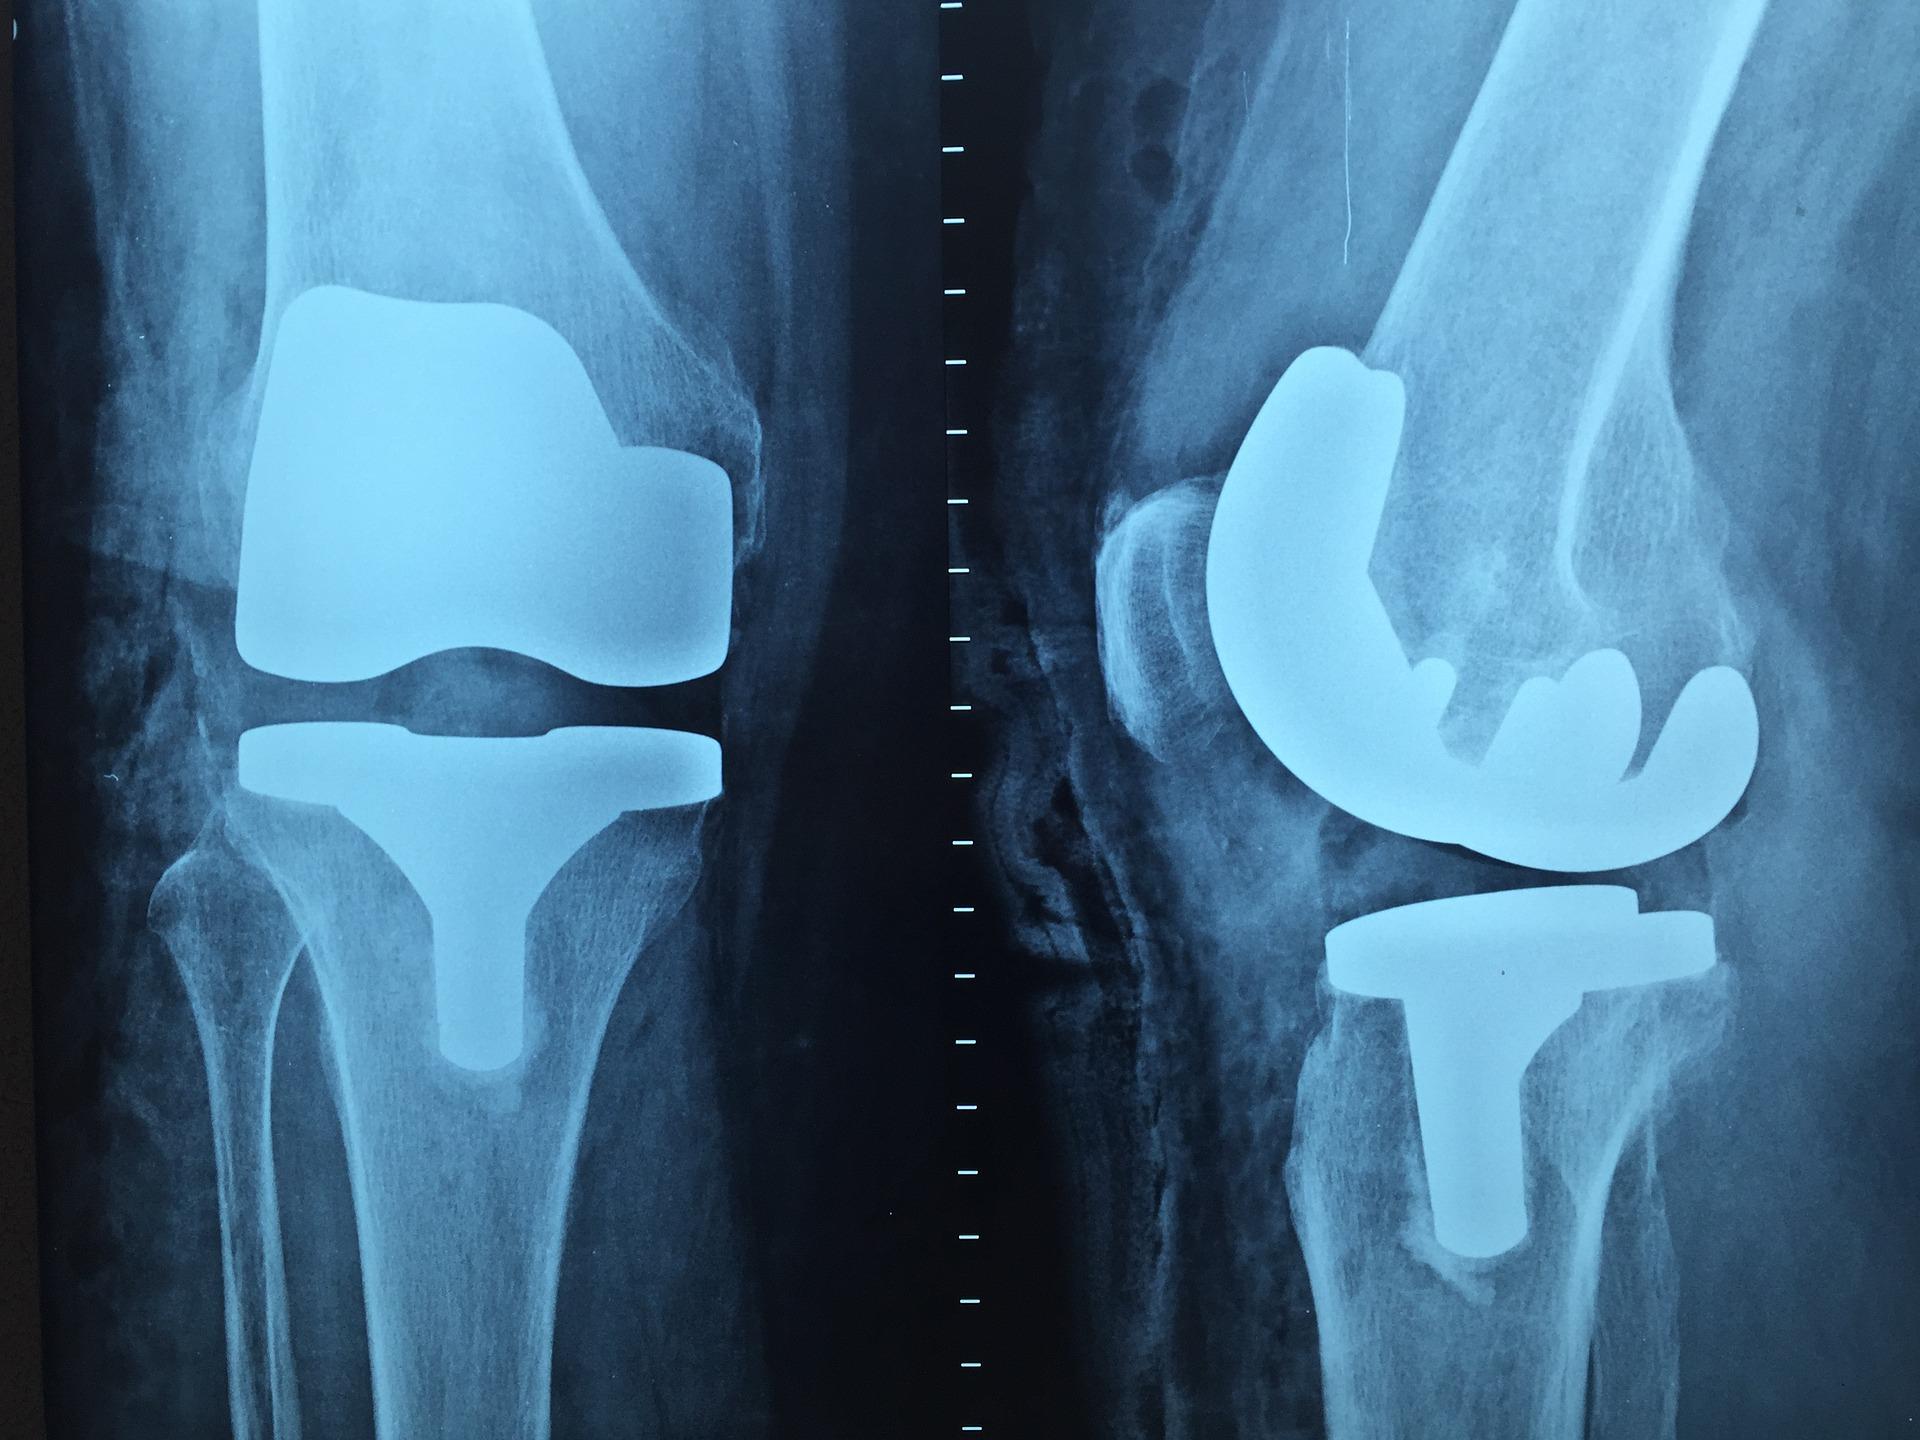 S bolestí zad a nohou na ortopedii